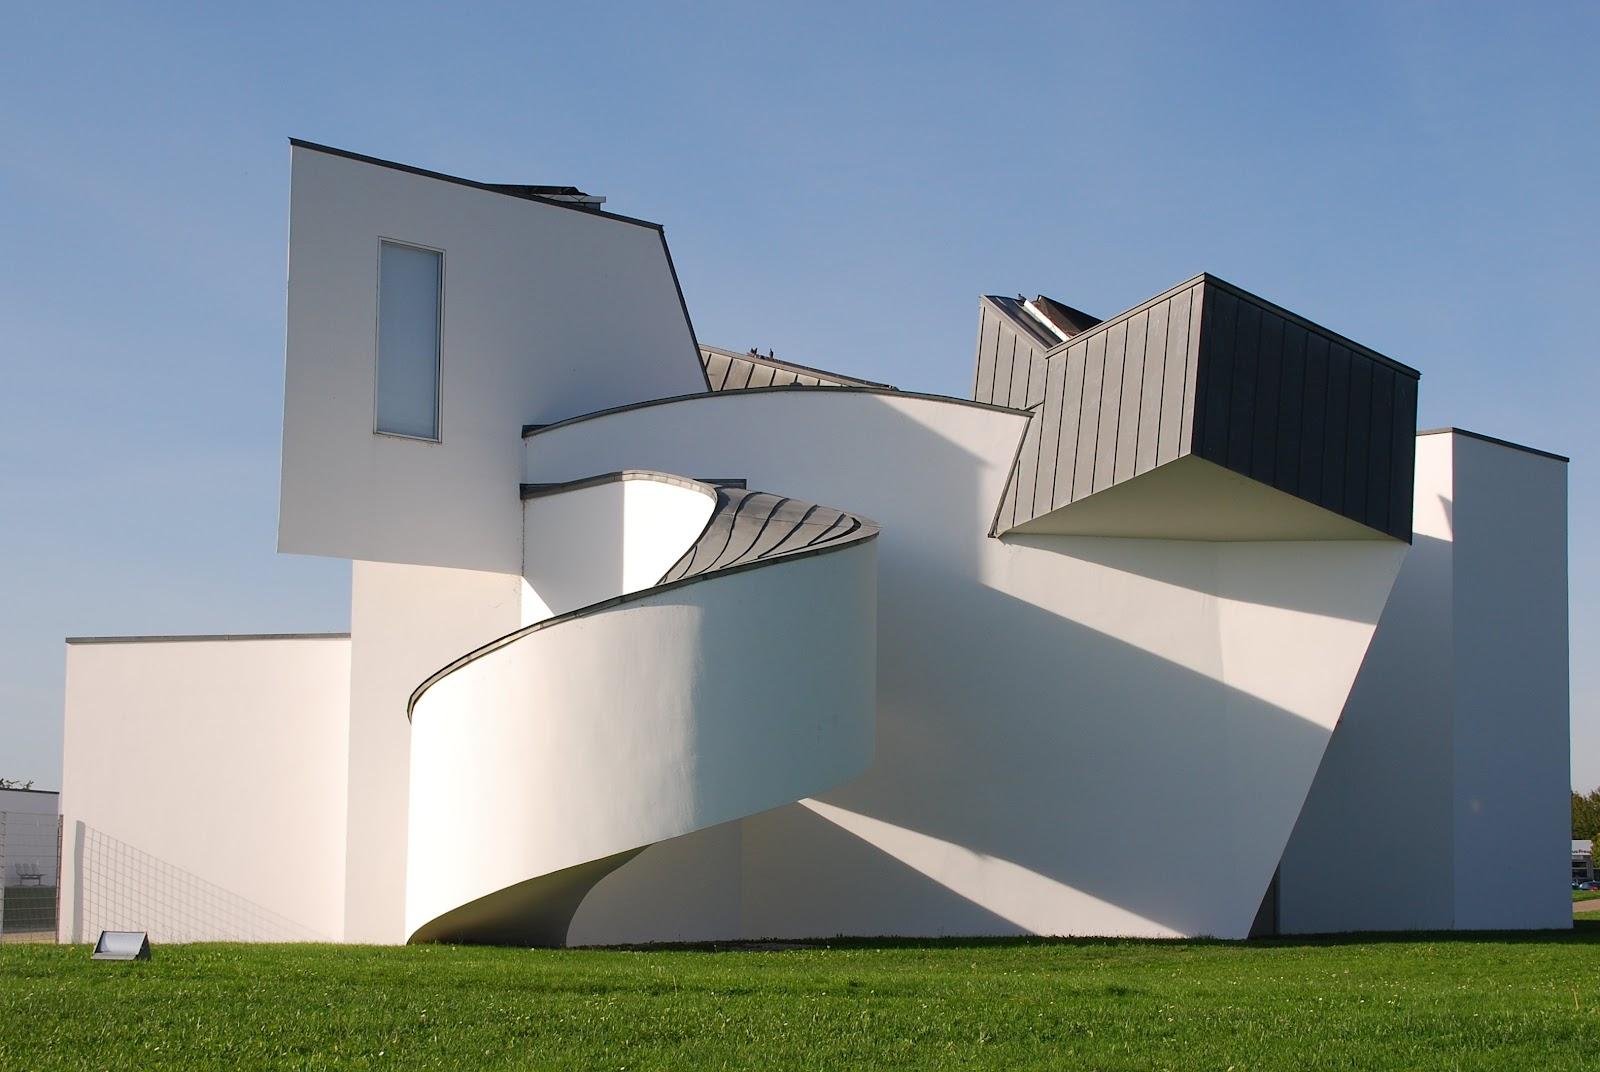 deconstructivism frank gehry gehry house. Black Bedroom Furniture Sets. Home Design Ideas